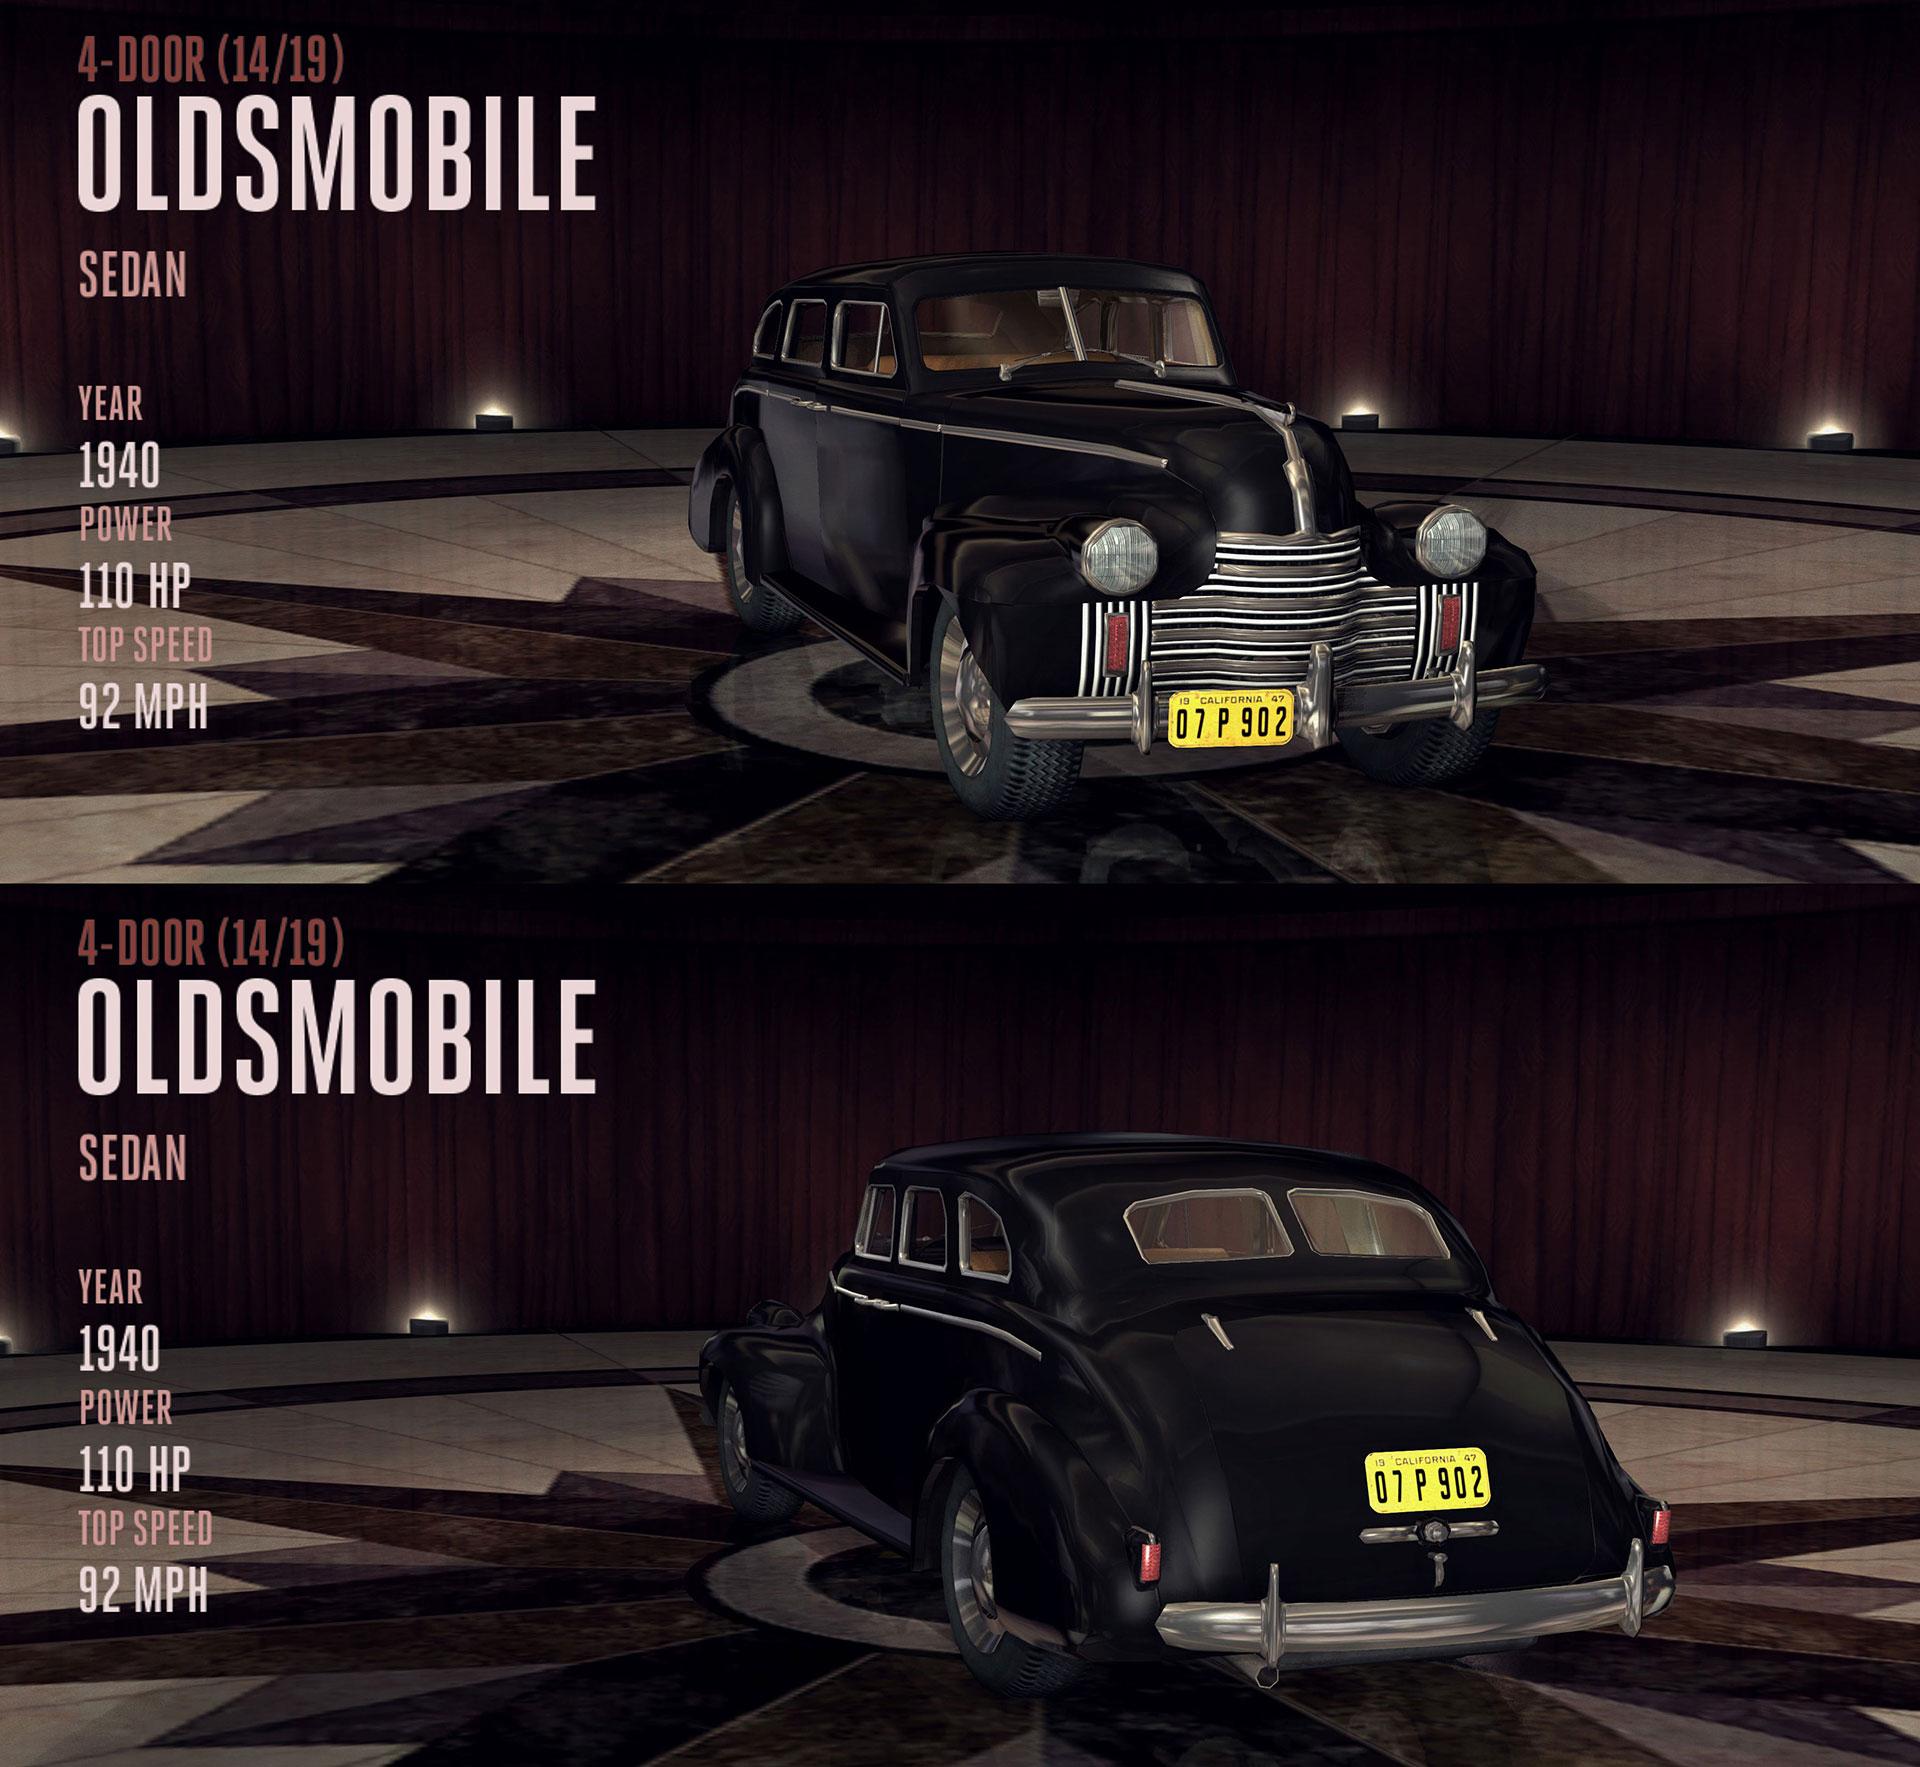 Archivo:1940-oldsmobile-sedan.jpg